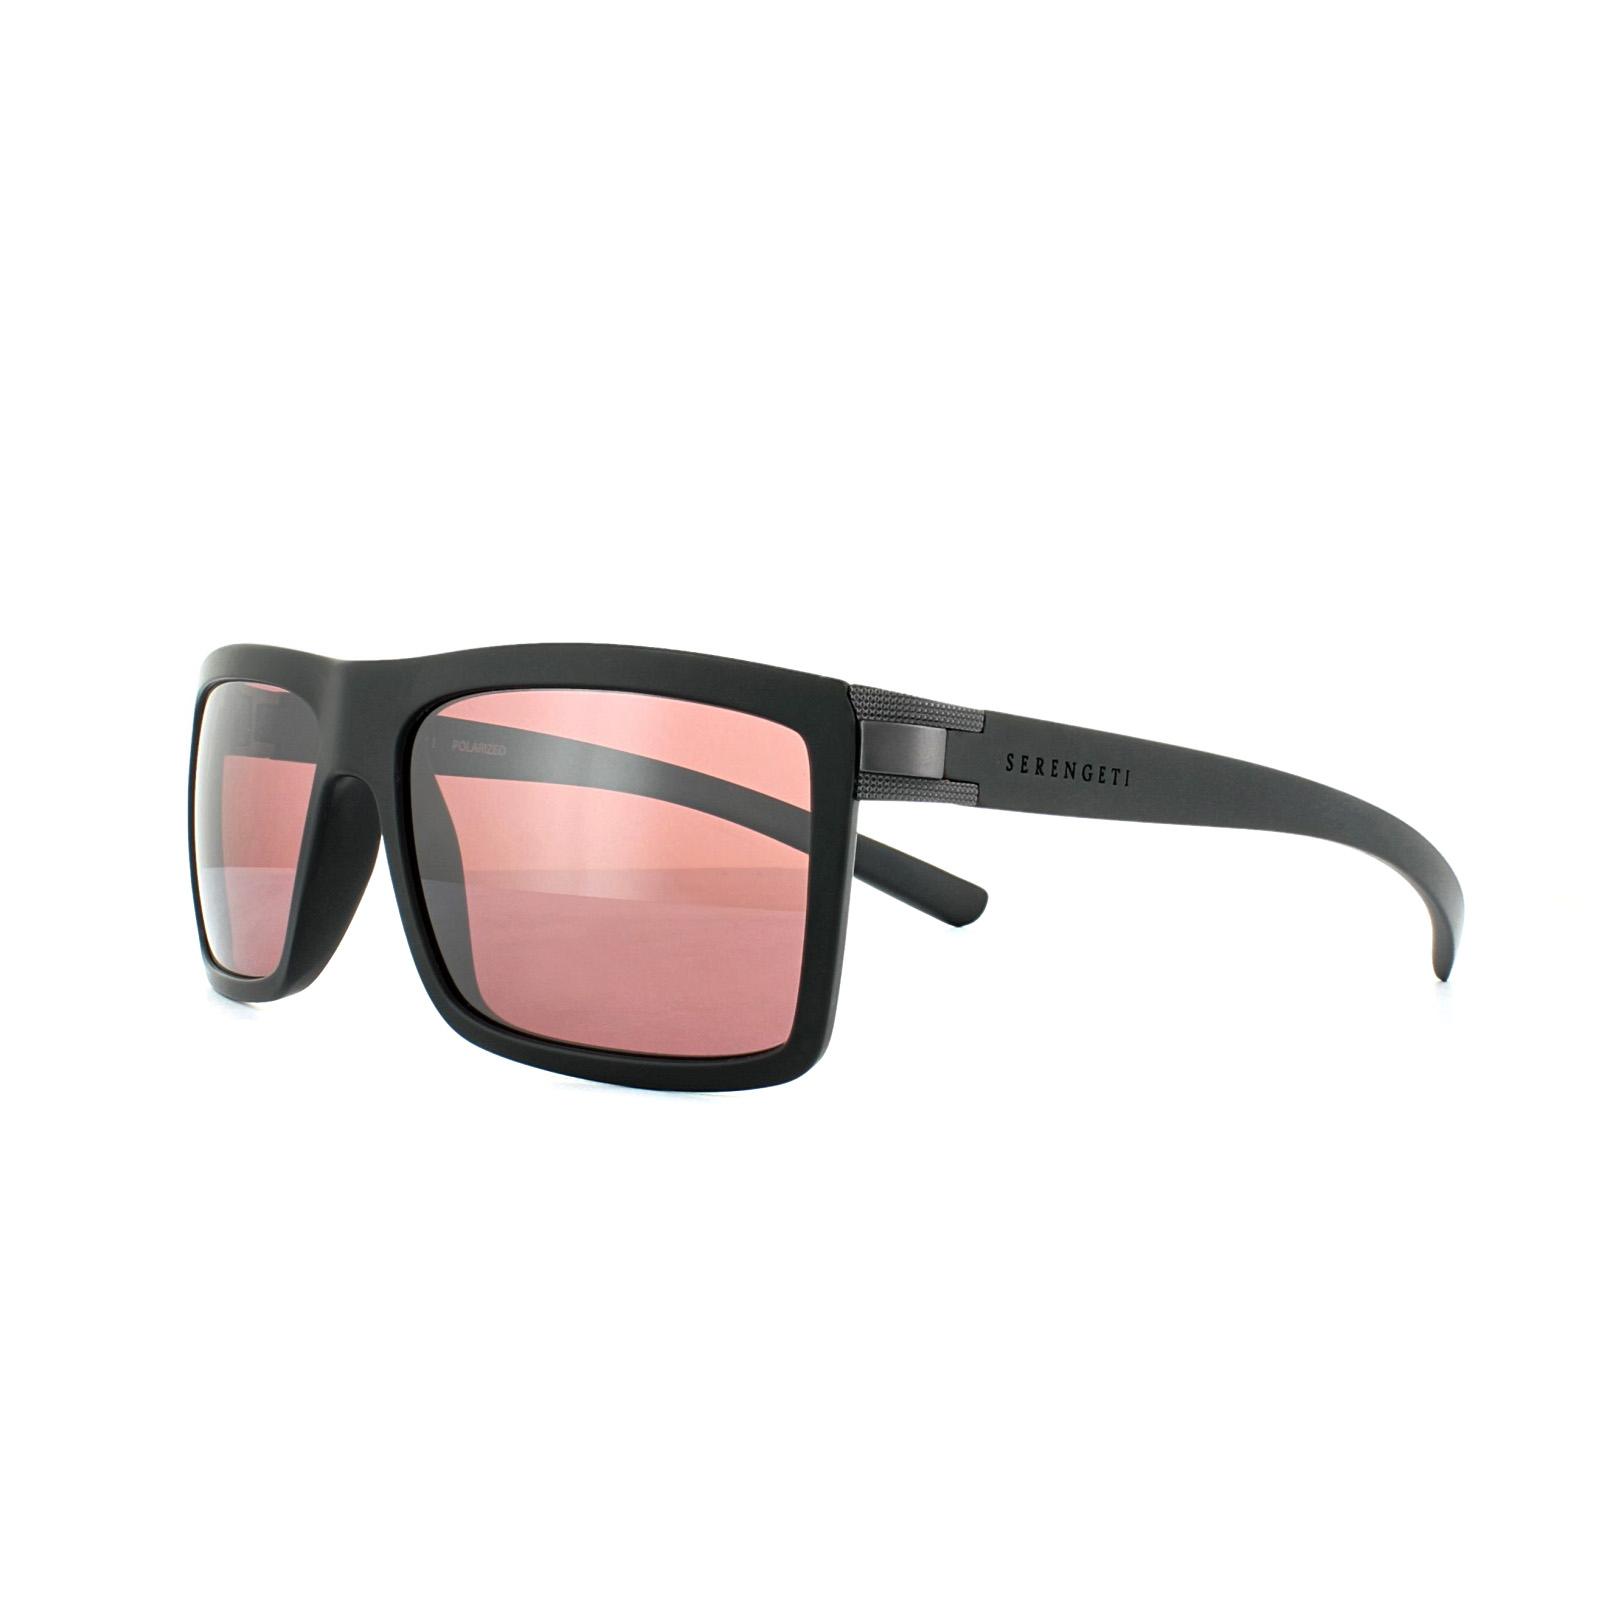 b1cc98893d Sentinel Serengeti Sunglasses Brera 8213 Sanded Black Sedona Pink Polarized